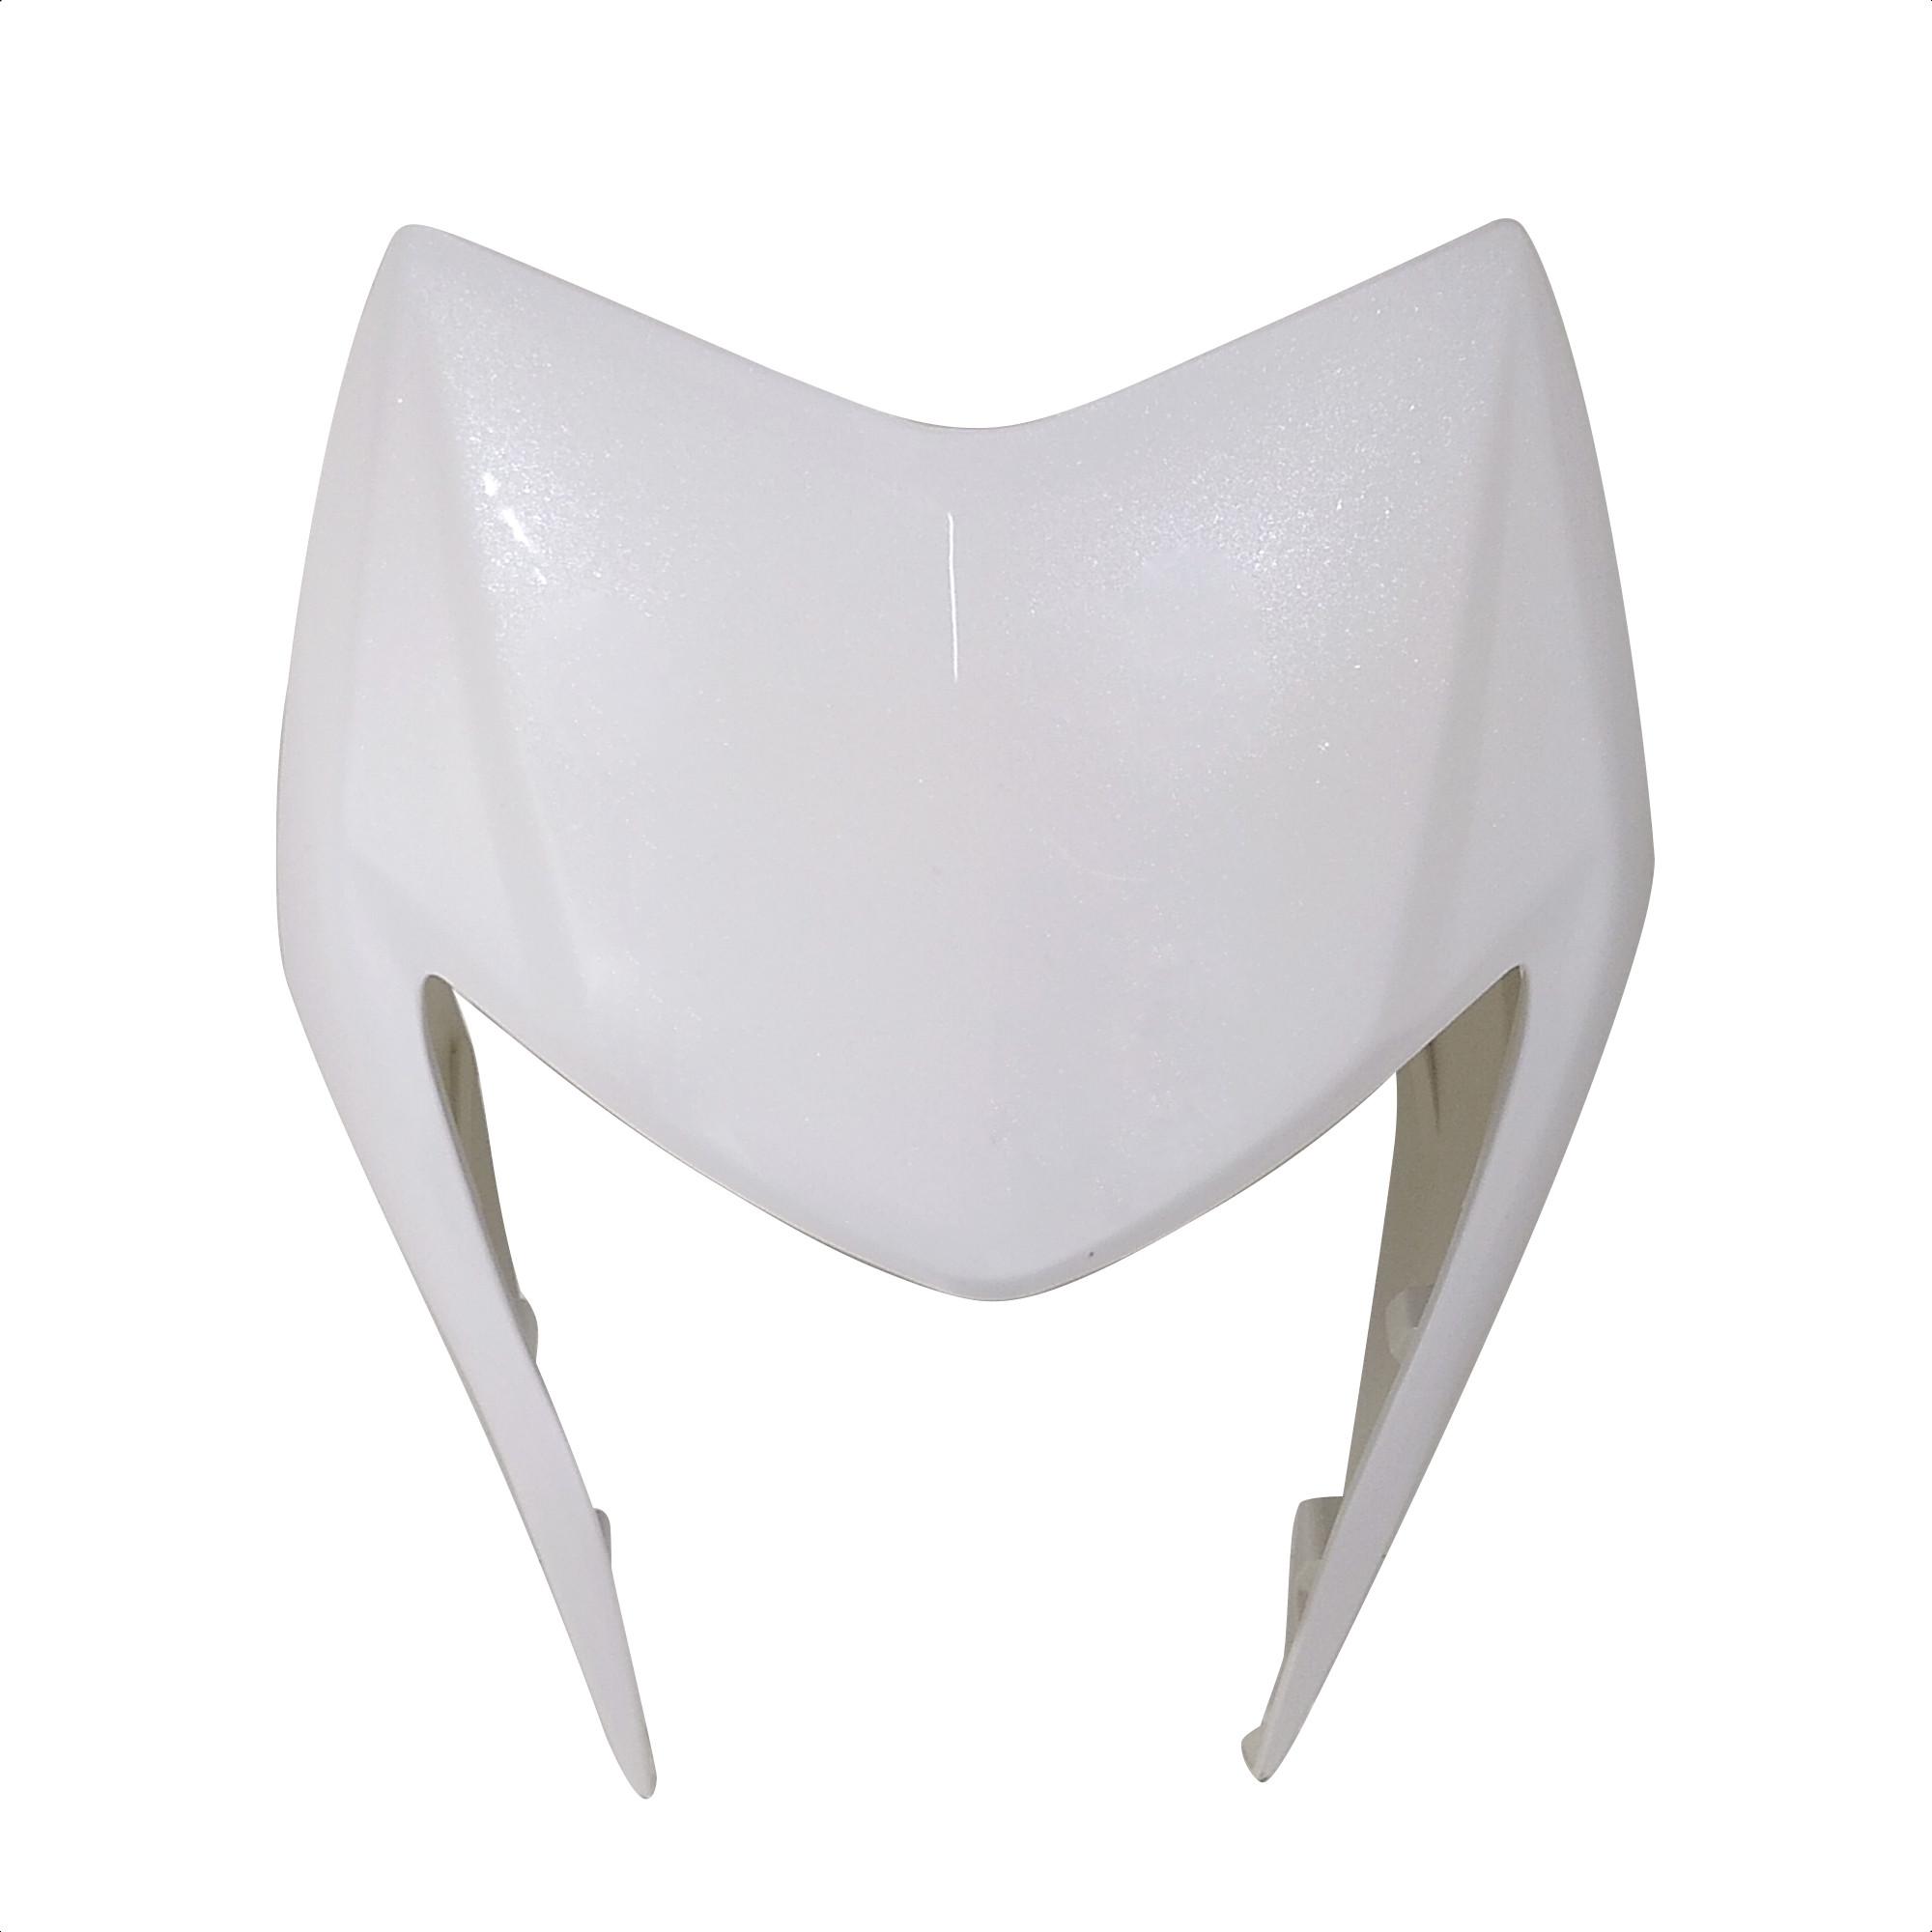 Cacha Mascara Cubre Optica Blanco Zanella Zr 150 Lt Original